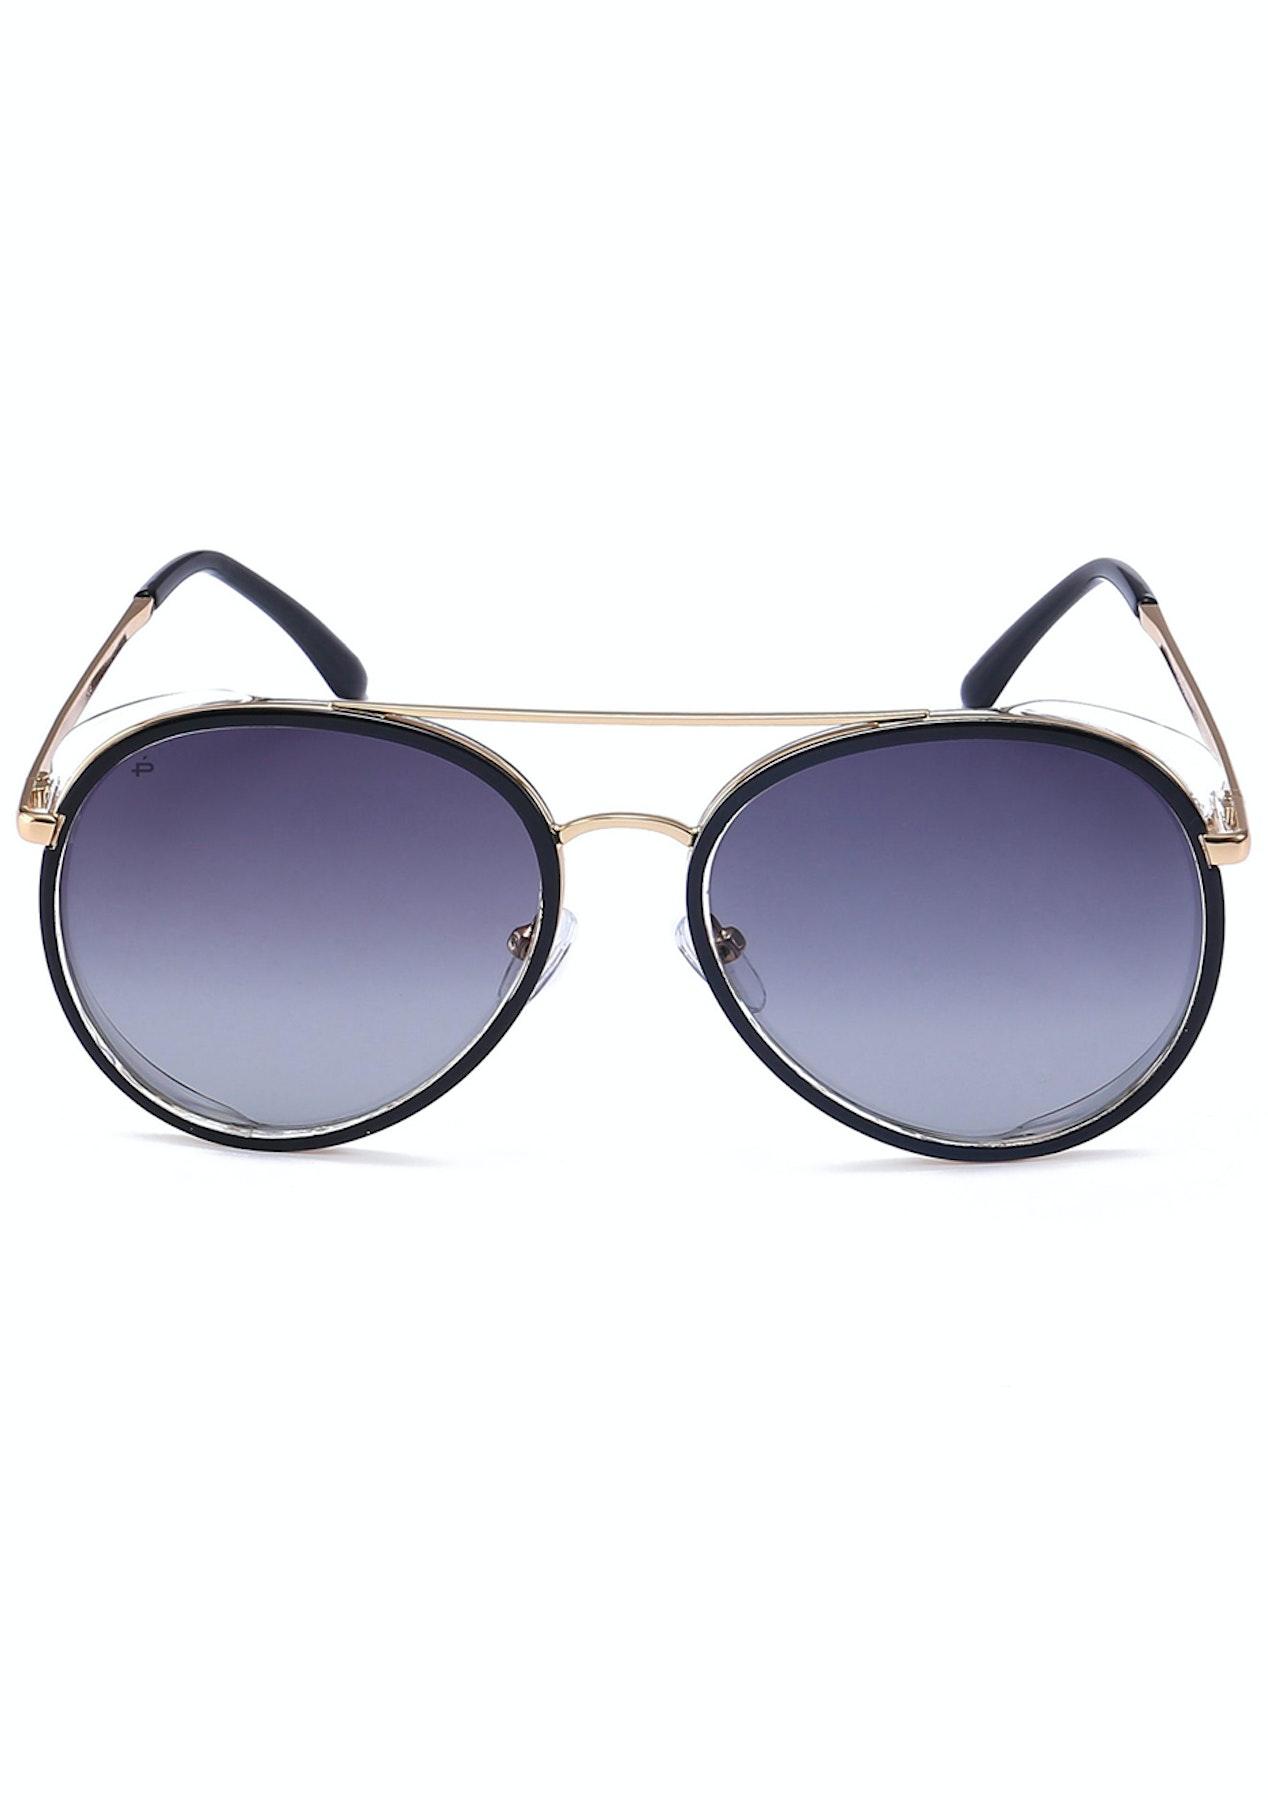 e09e8607886a Prive© Revaux The Godfather Polarised Sunglasses - Black - Prive Revaux  Sunglasses - Onceit